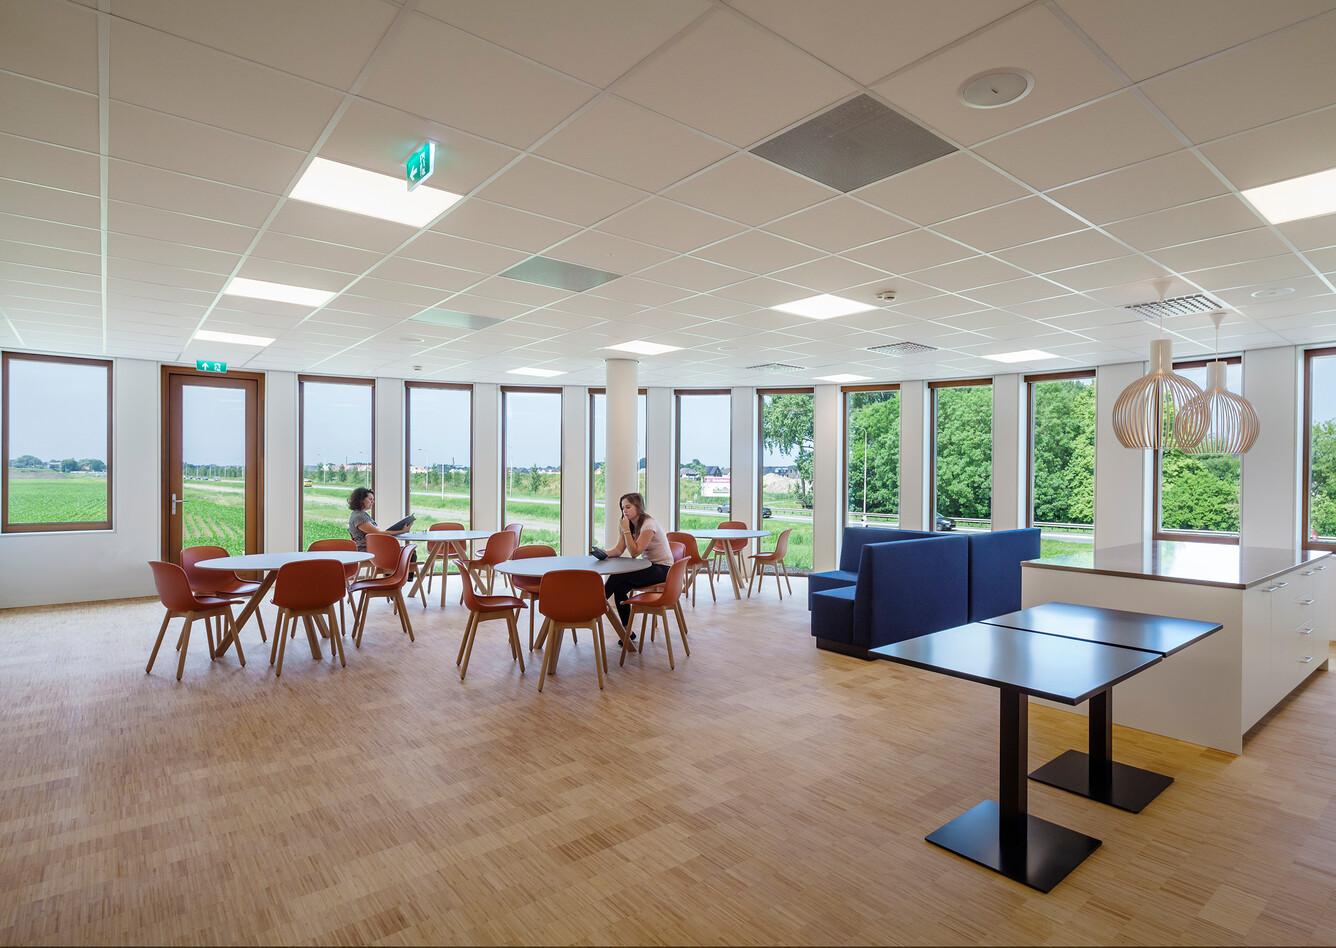 Royal Ahrend healthcare project interior view of Oogcentrum Noordholland in Heerhugowaard SB200620